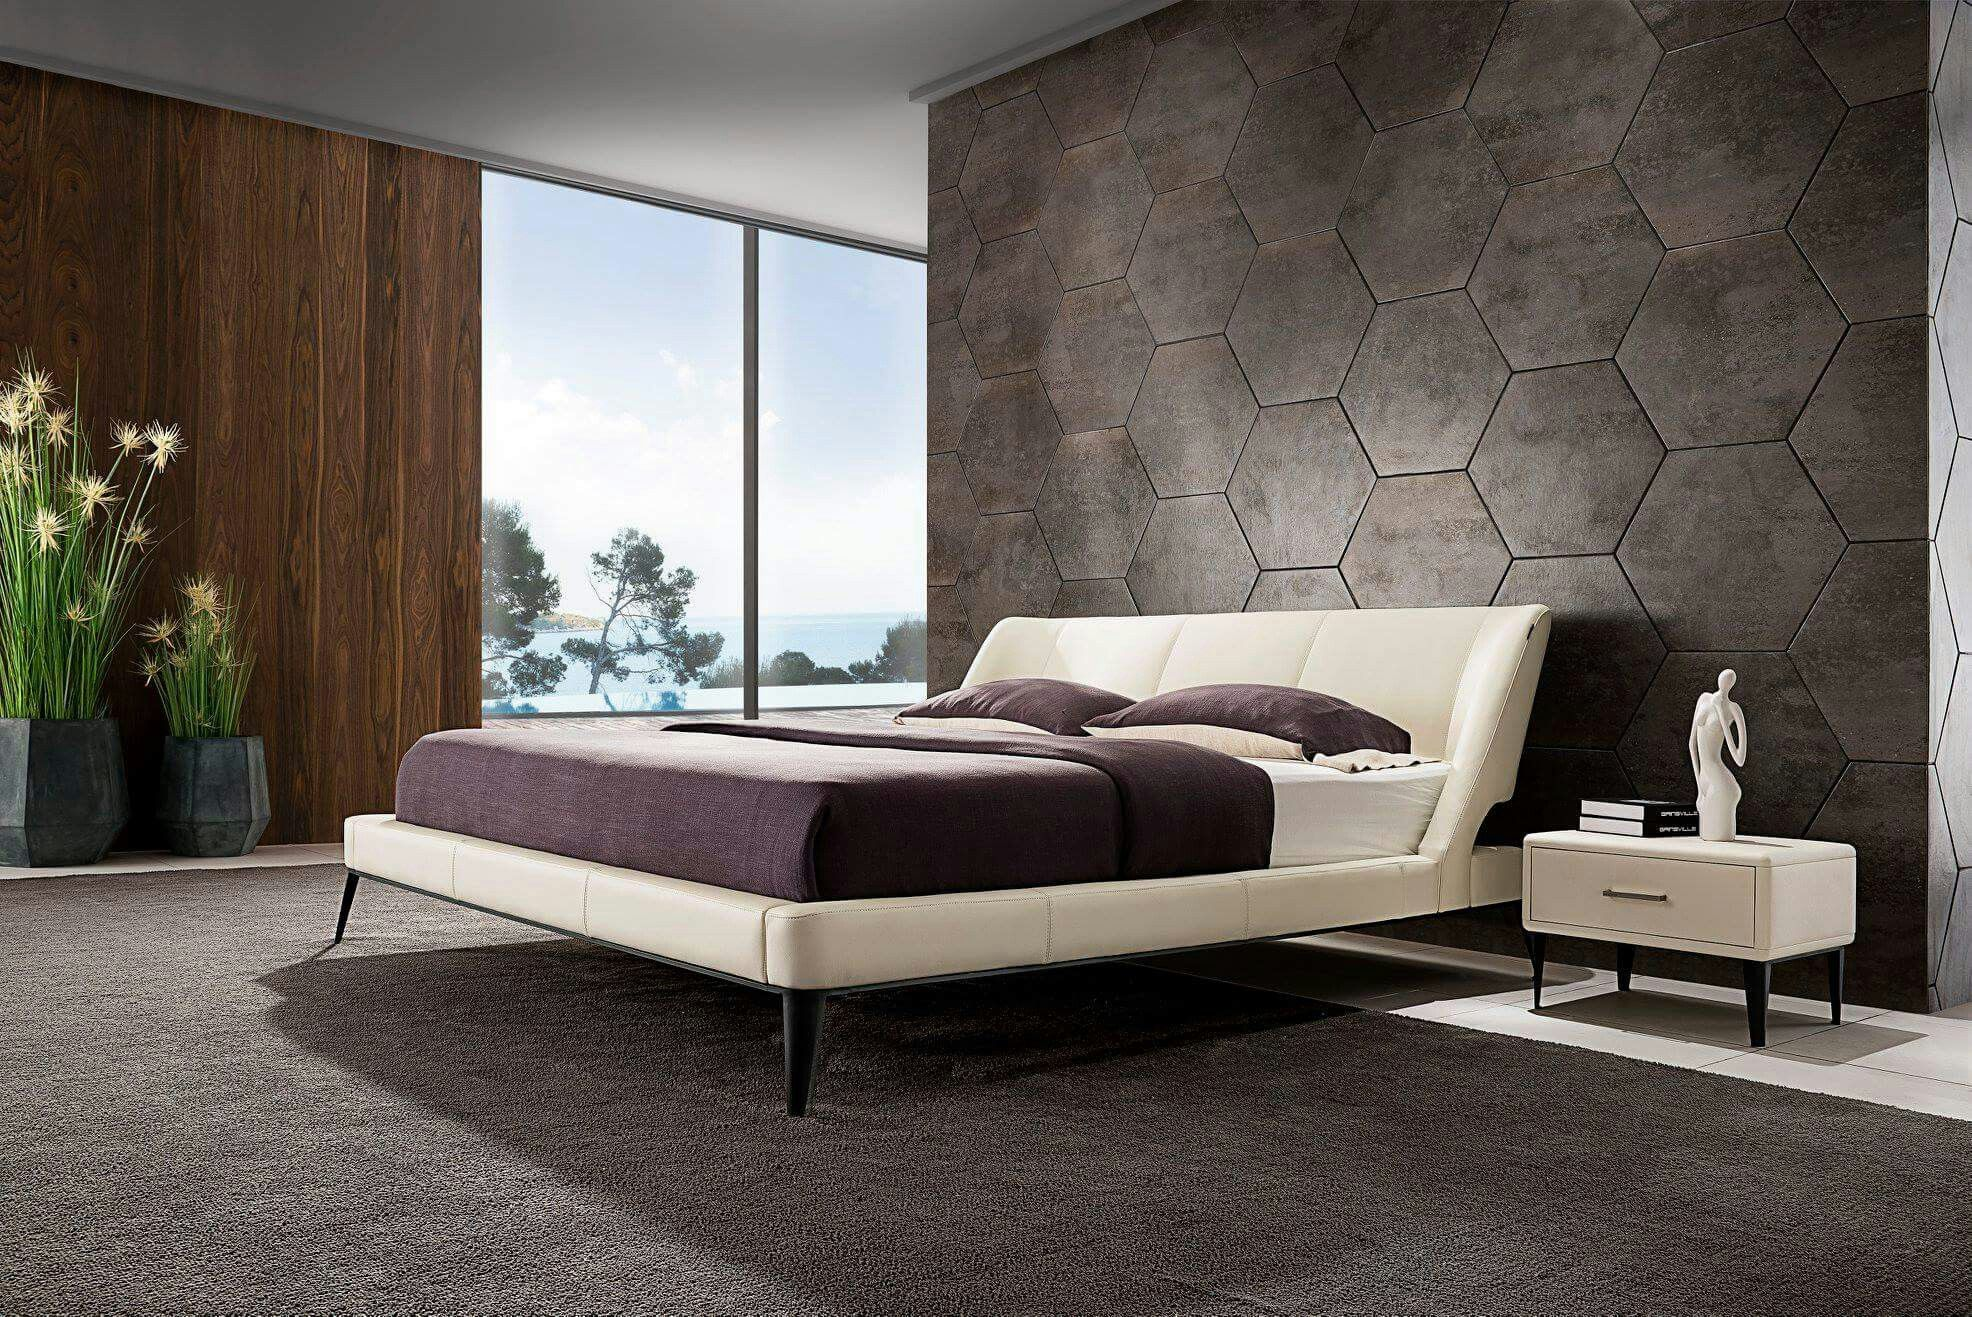 Pin By Alina On Bedroom Bedroom Decor Design Modern Bedroom Furniture Modern Bedroom Set